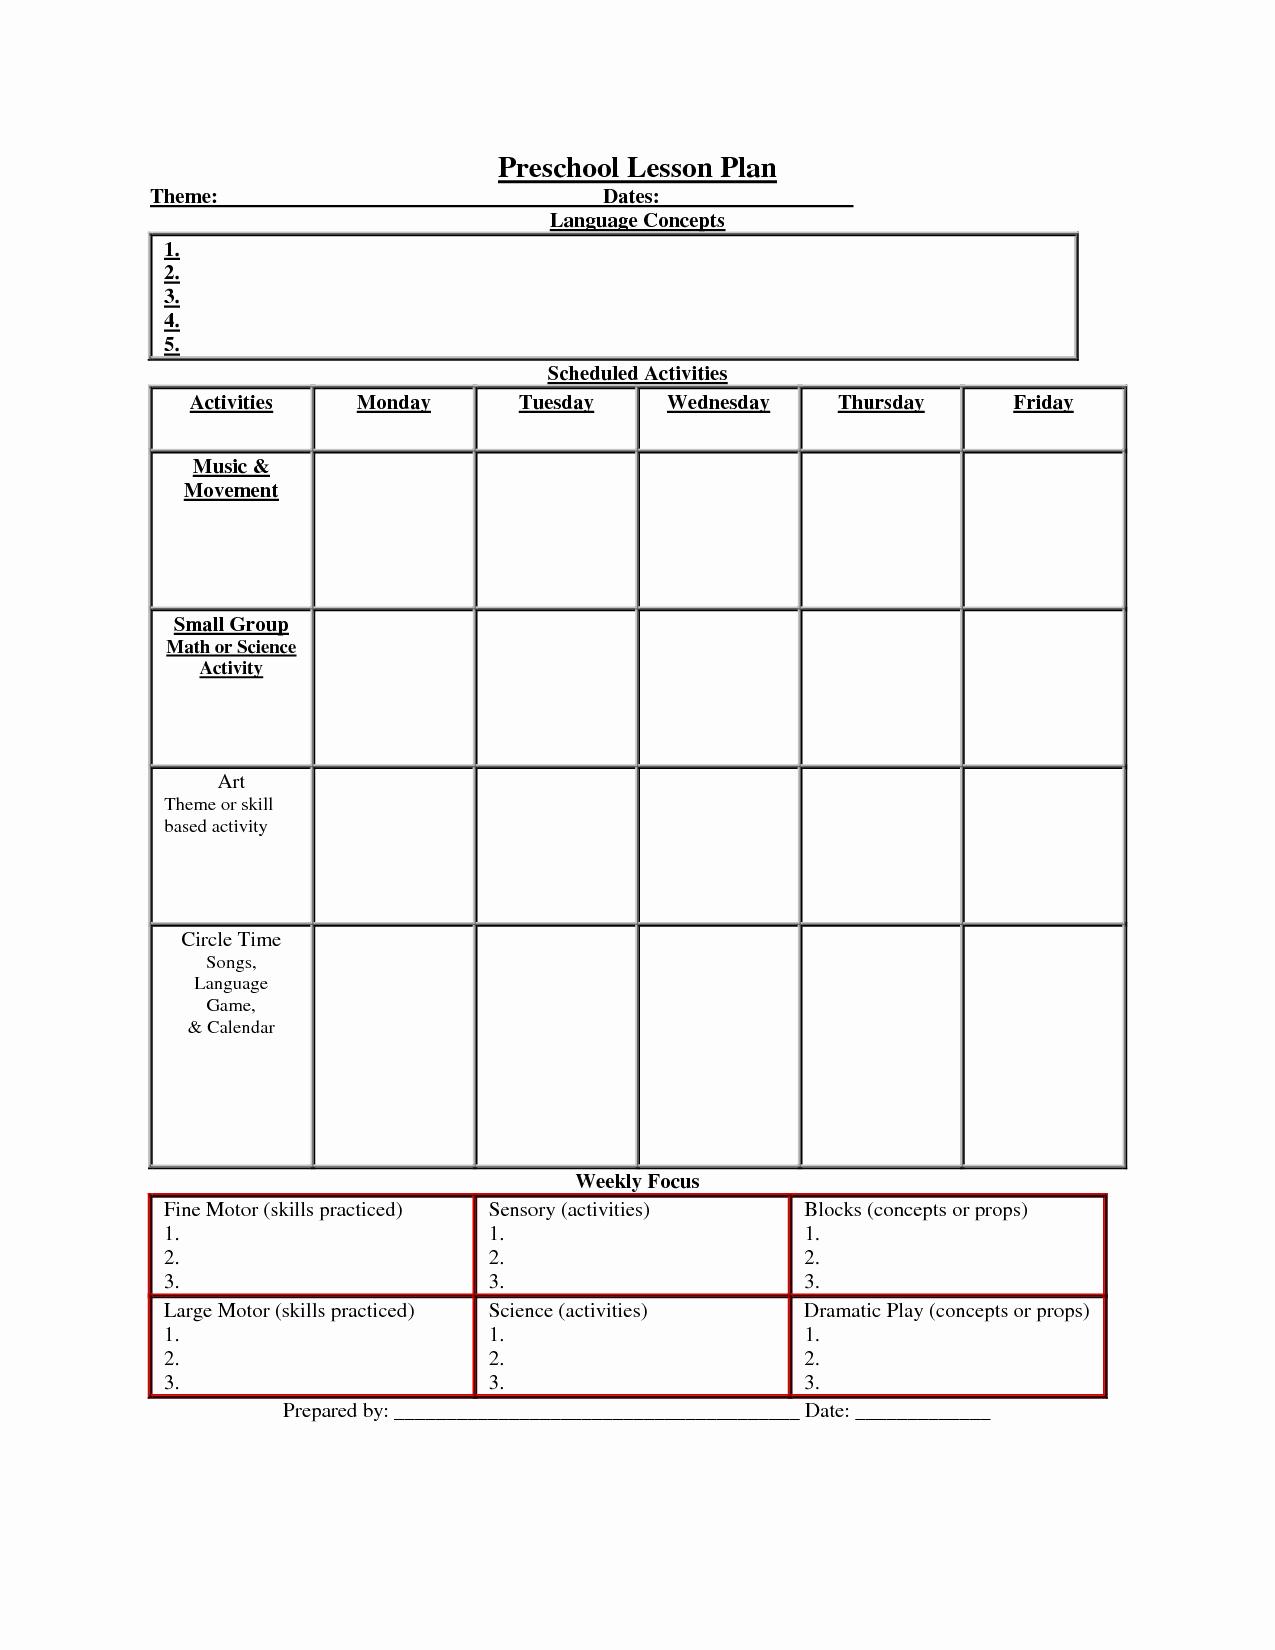 Lesson Plan Template for Preschool Fresh Printable Lesson Plan Template Nuttin but Preschool